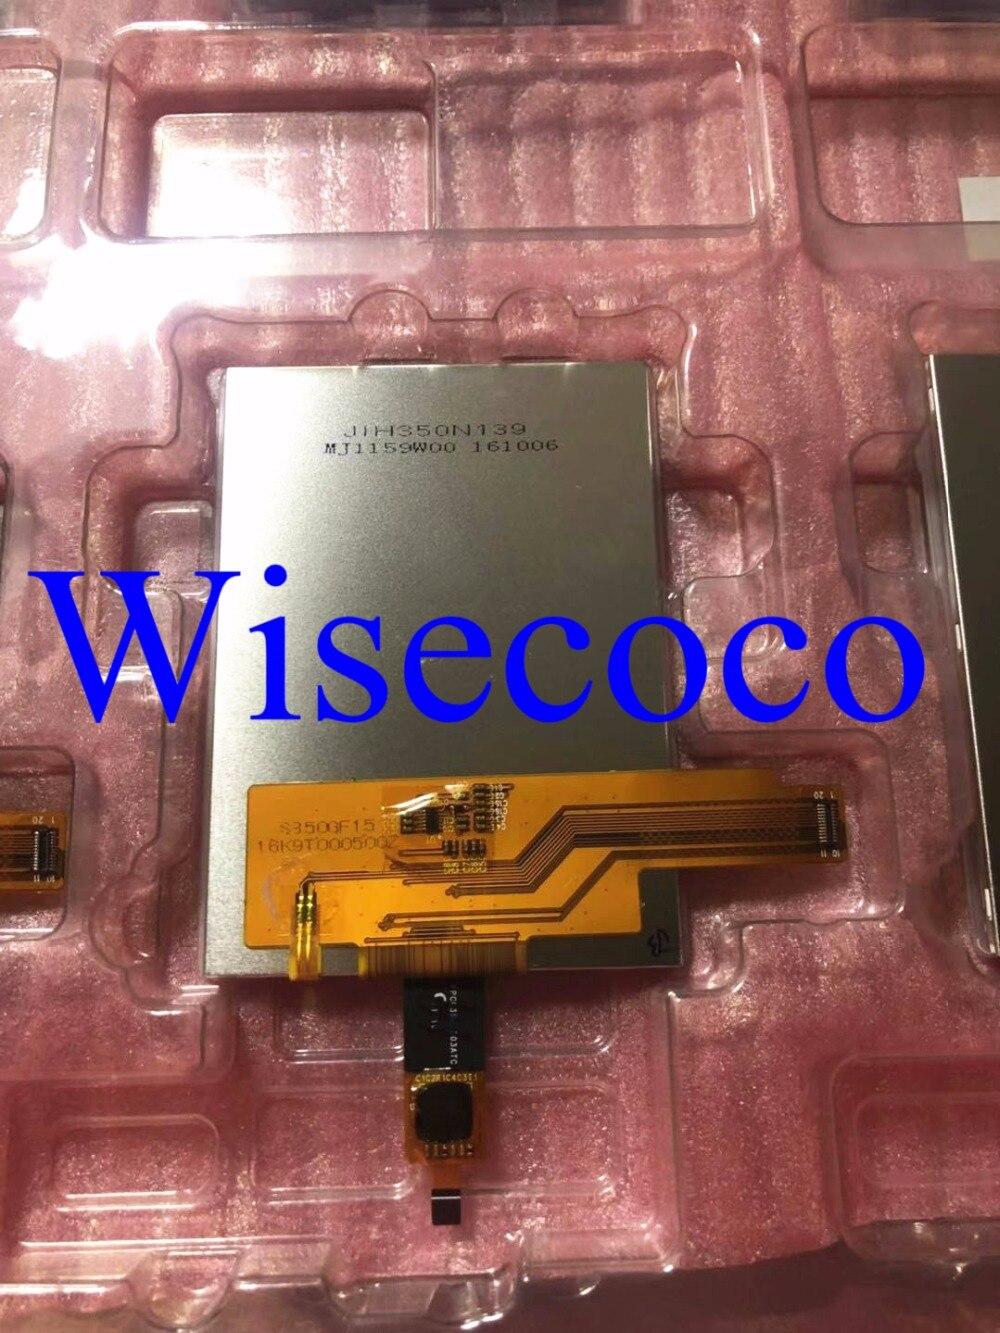 Original NEW 3.5 inch JIH350N139 JIH350T139 480*640 lcd screen display panel testedOriginal NEW 3.5 inch JIH350N139 JIH350T139 480*640 lcd screen display panel tested